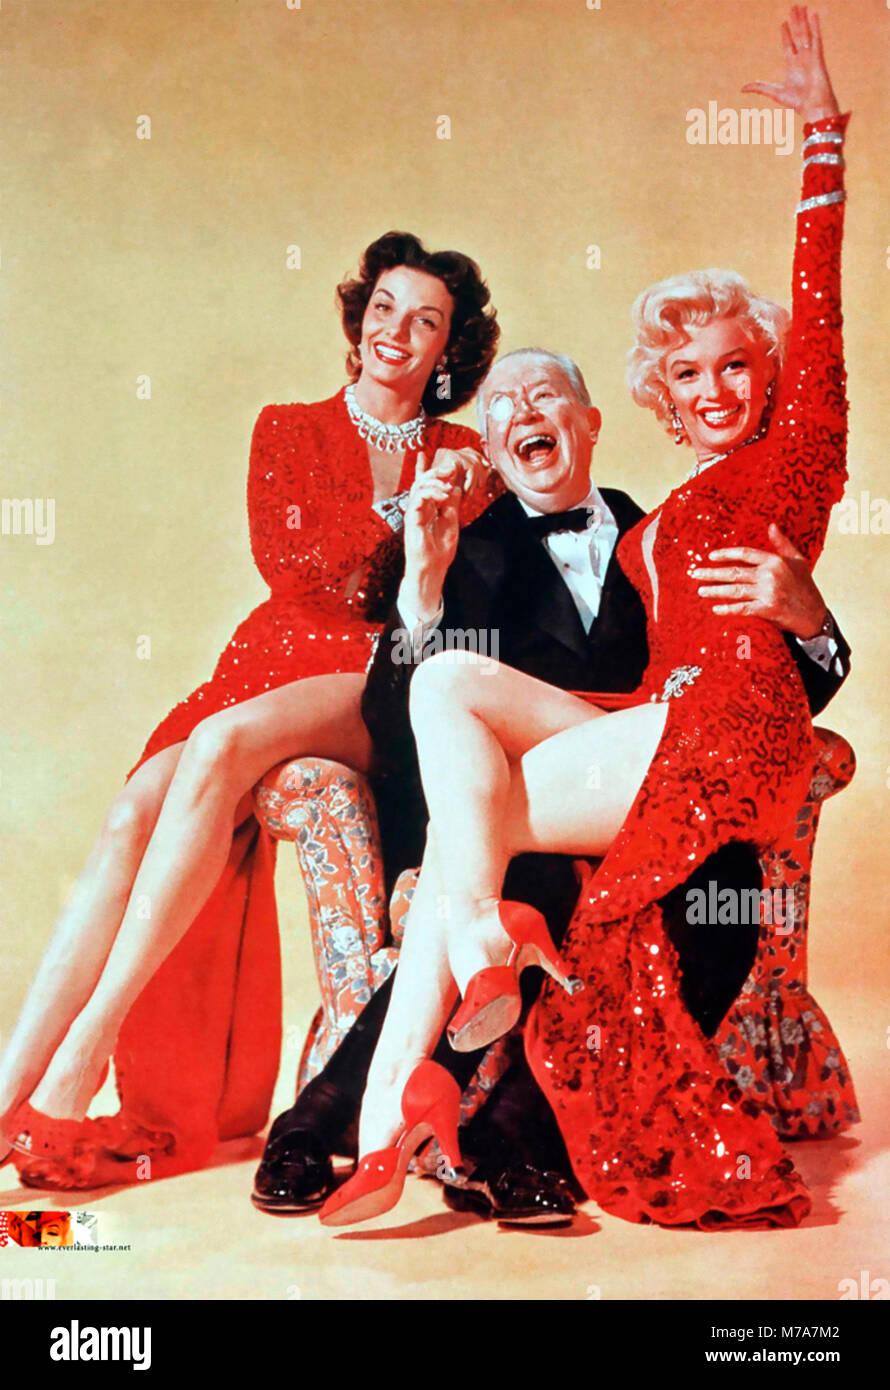 GENTLEMEN PREFER BLONDES 1953 20th Century Fox film with from left: Jane Russell, Charles Coburn, Marilyn Monroe - Stock Image